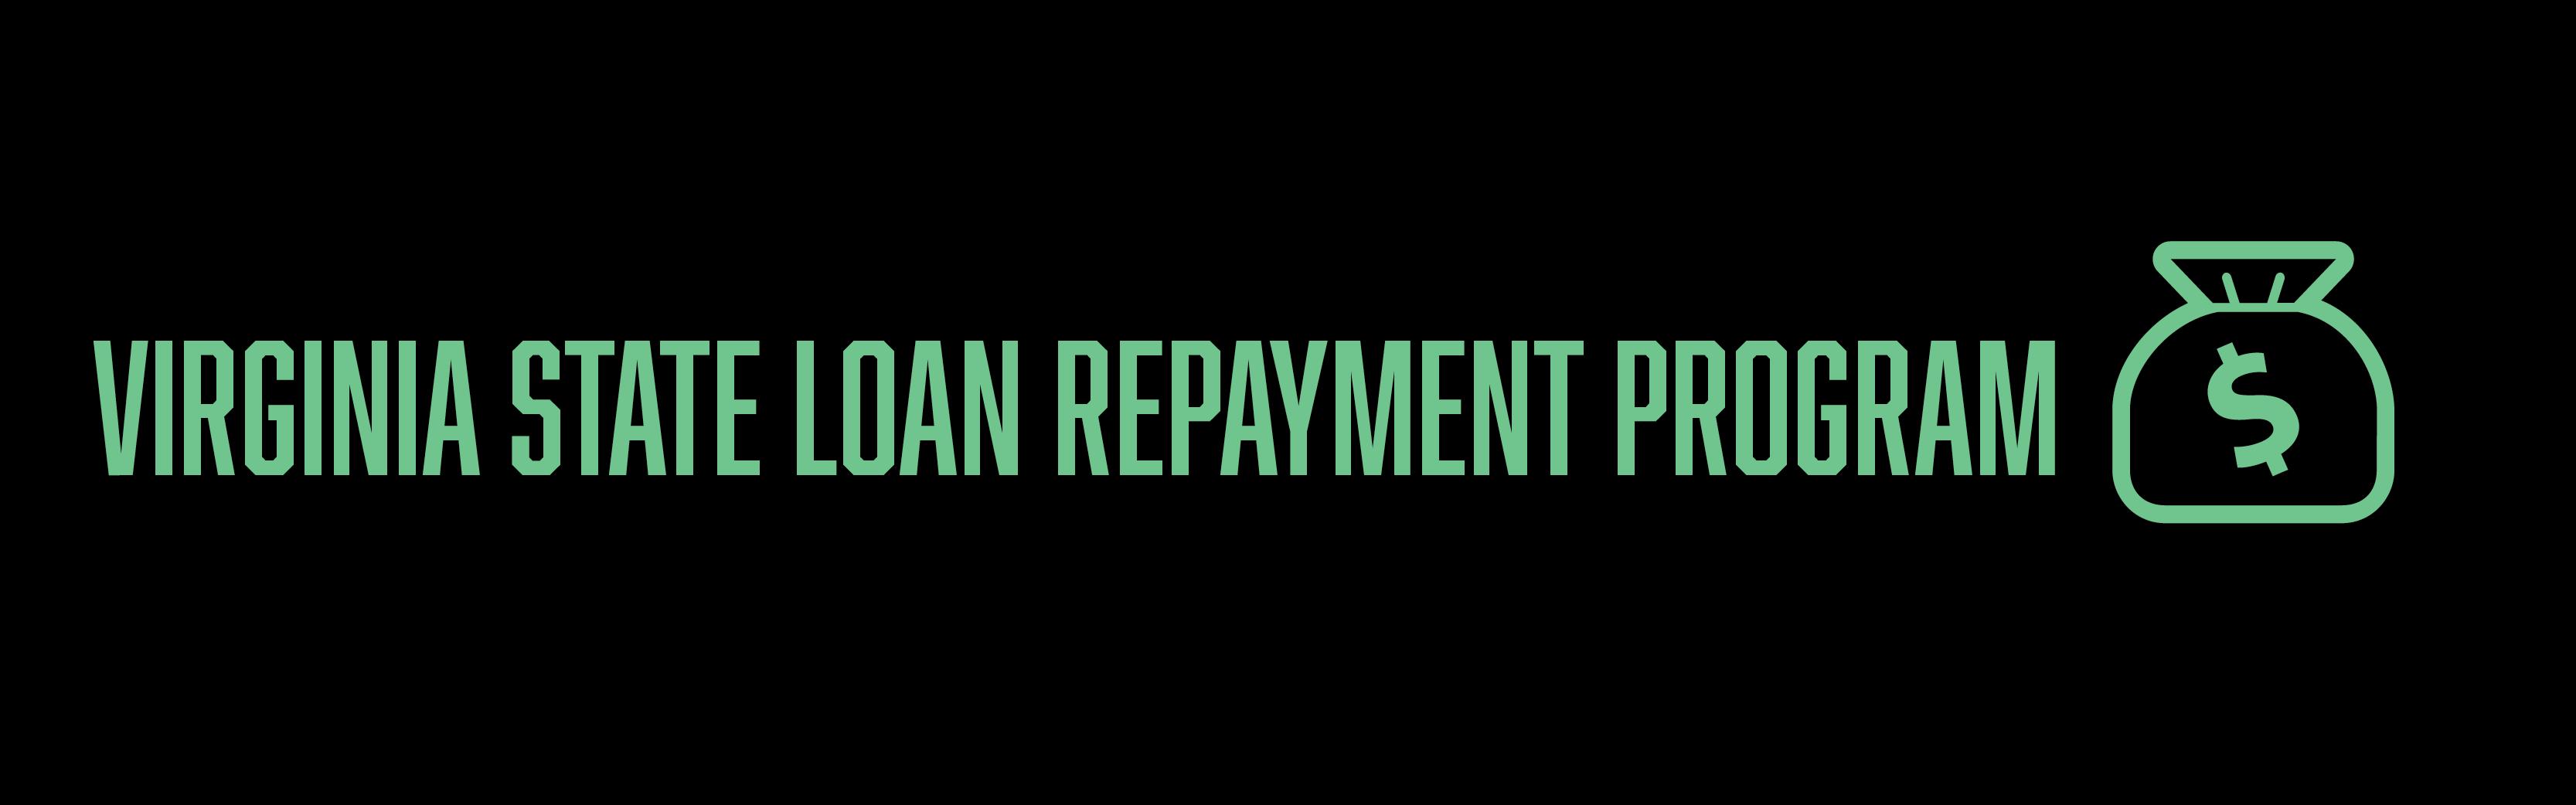 Virginia Loan Repayment Programs Health Equity